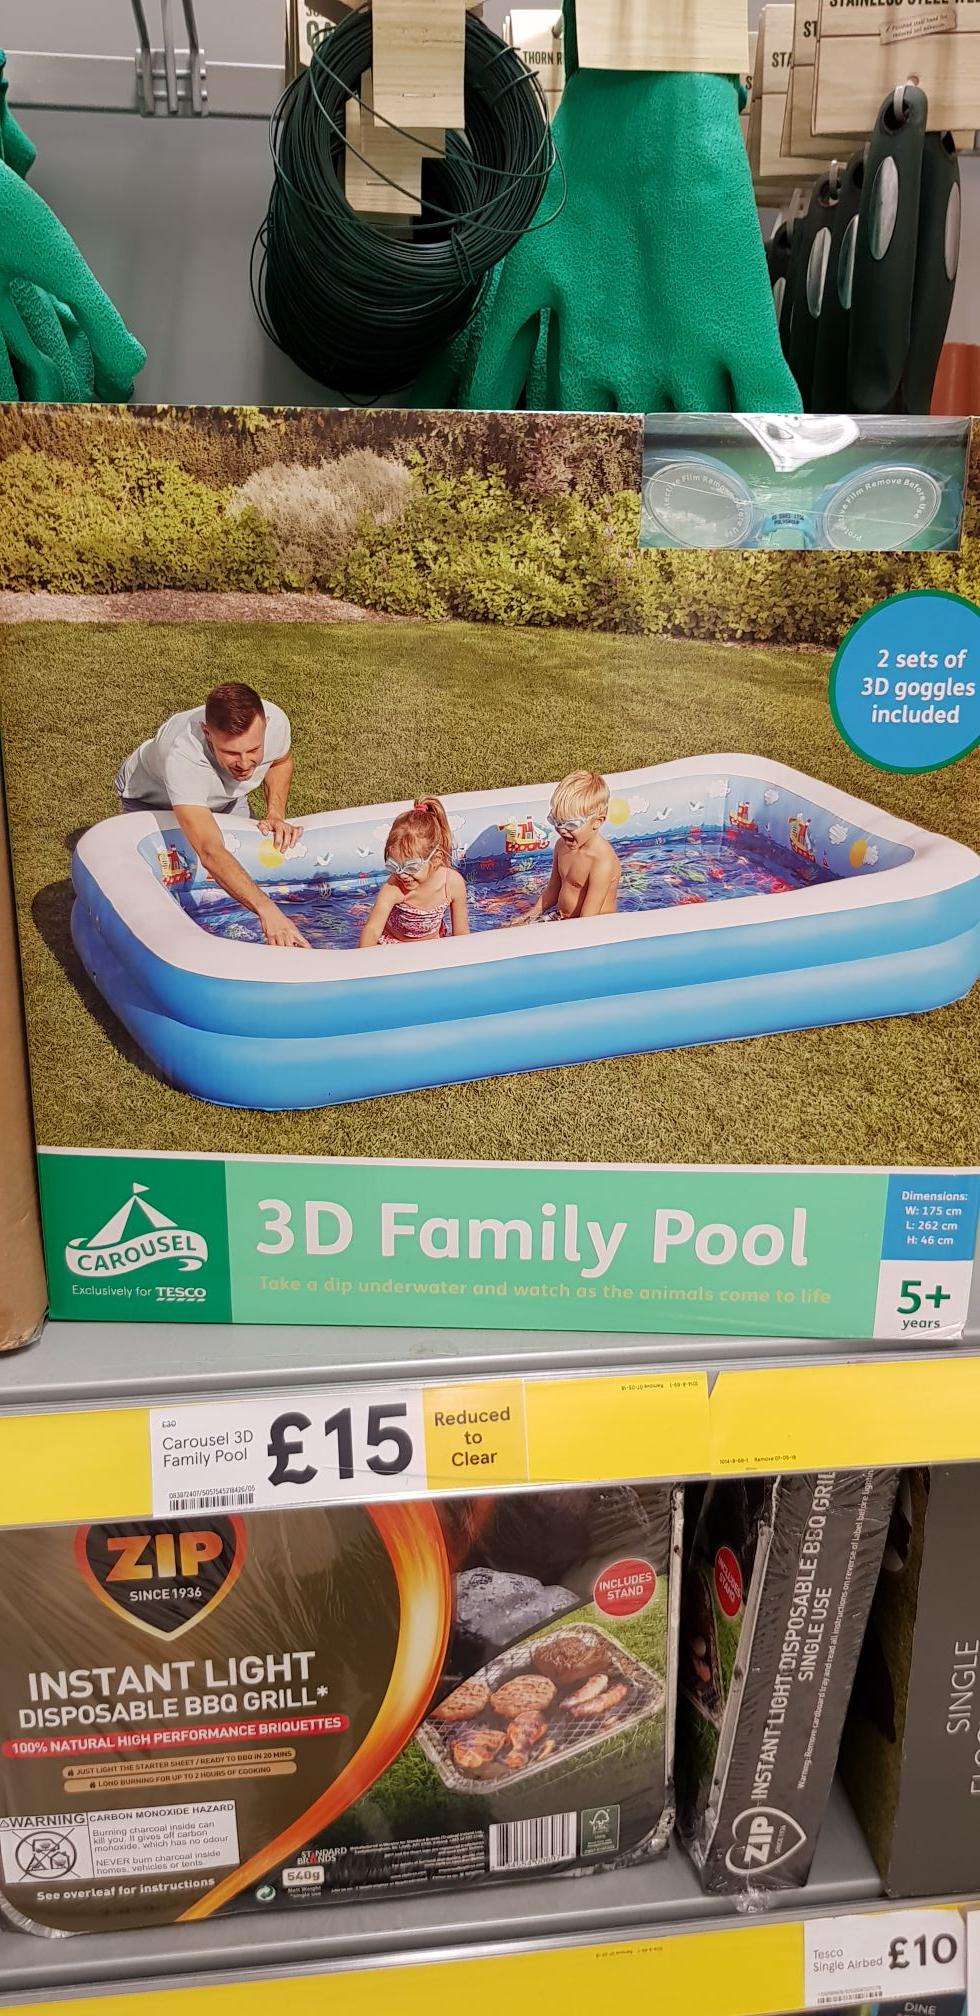 LARGE 3D FAMILY PADDLING POOL £15 - Tesco